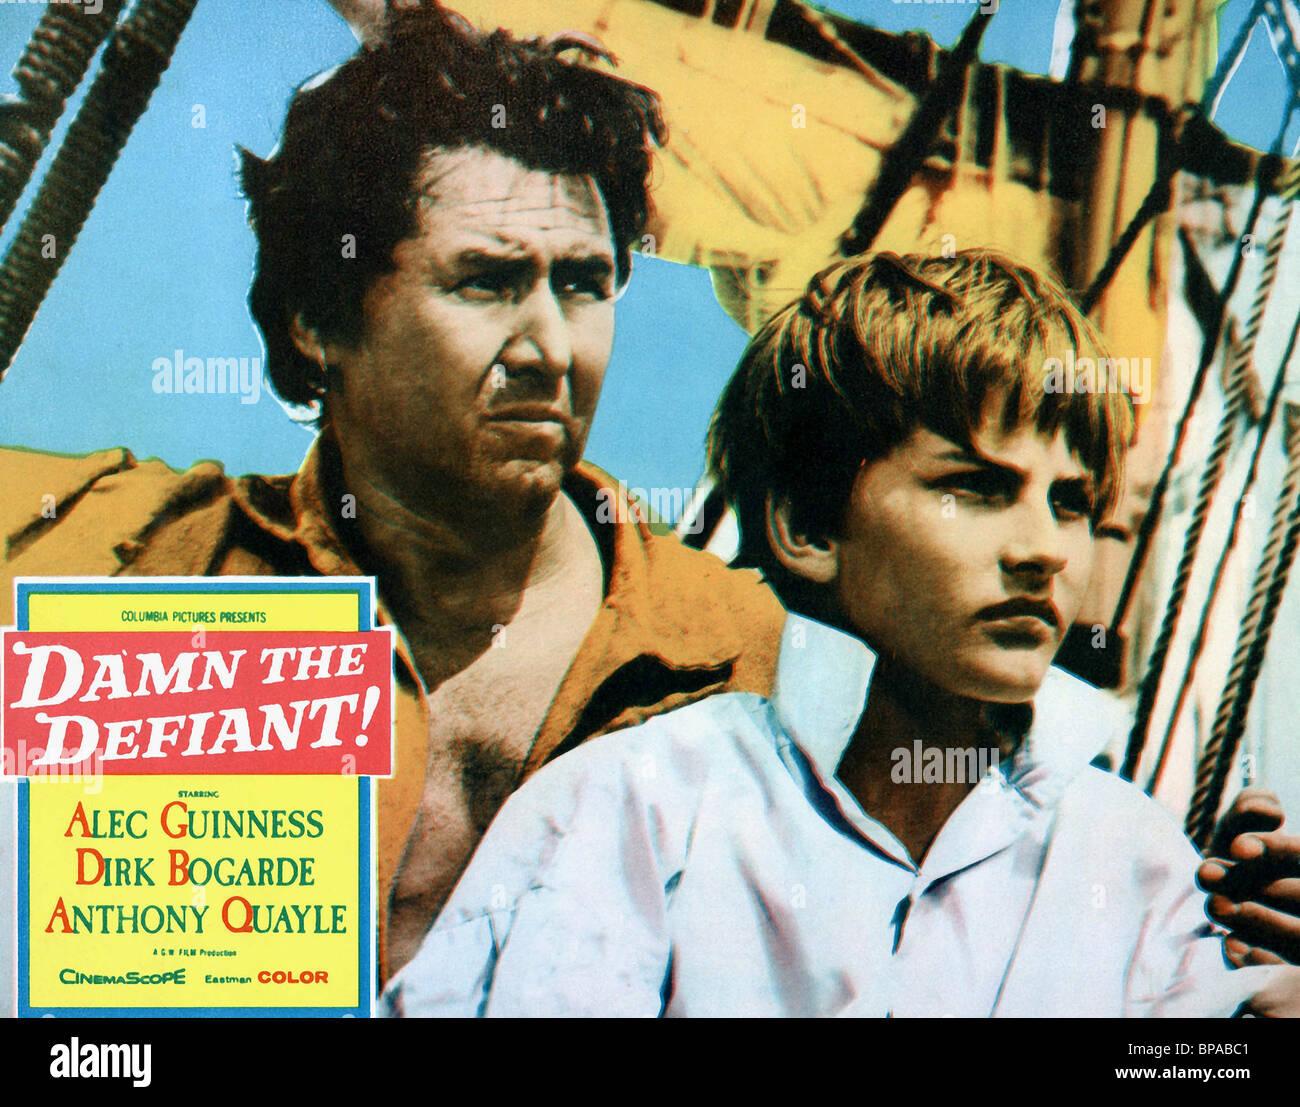 ANTHONY QUAYLE H.M.S. DEFIANT; DAMN THE DEFIANT (1962) - Stock Image